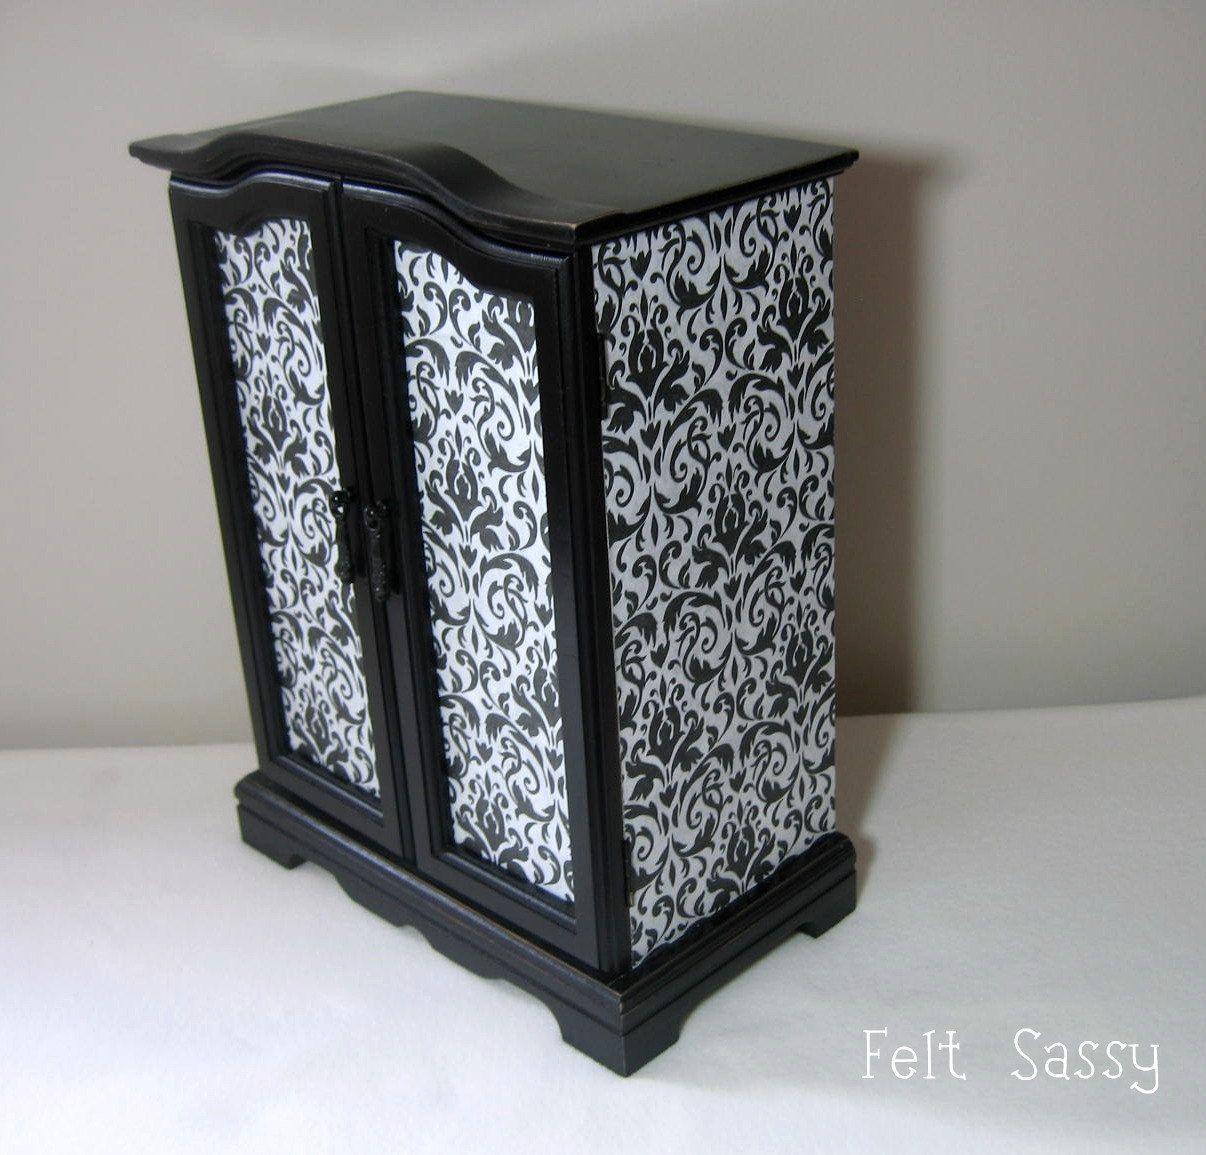 Refurbished Jewelry Box Large Burlesque Ii By